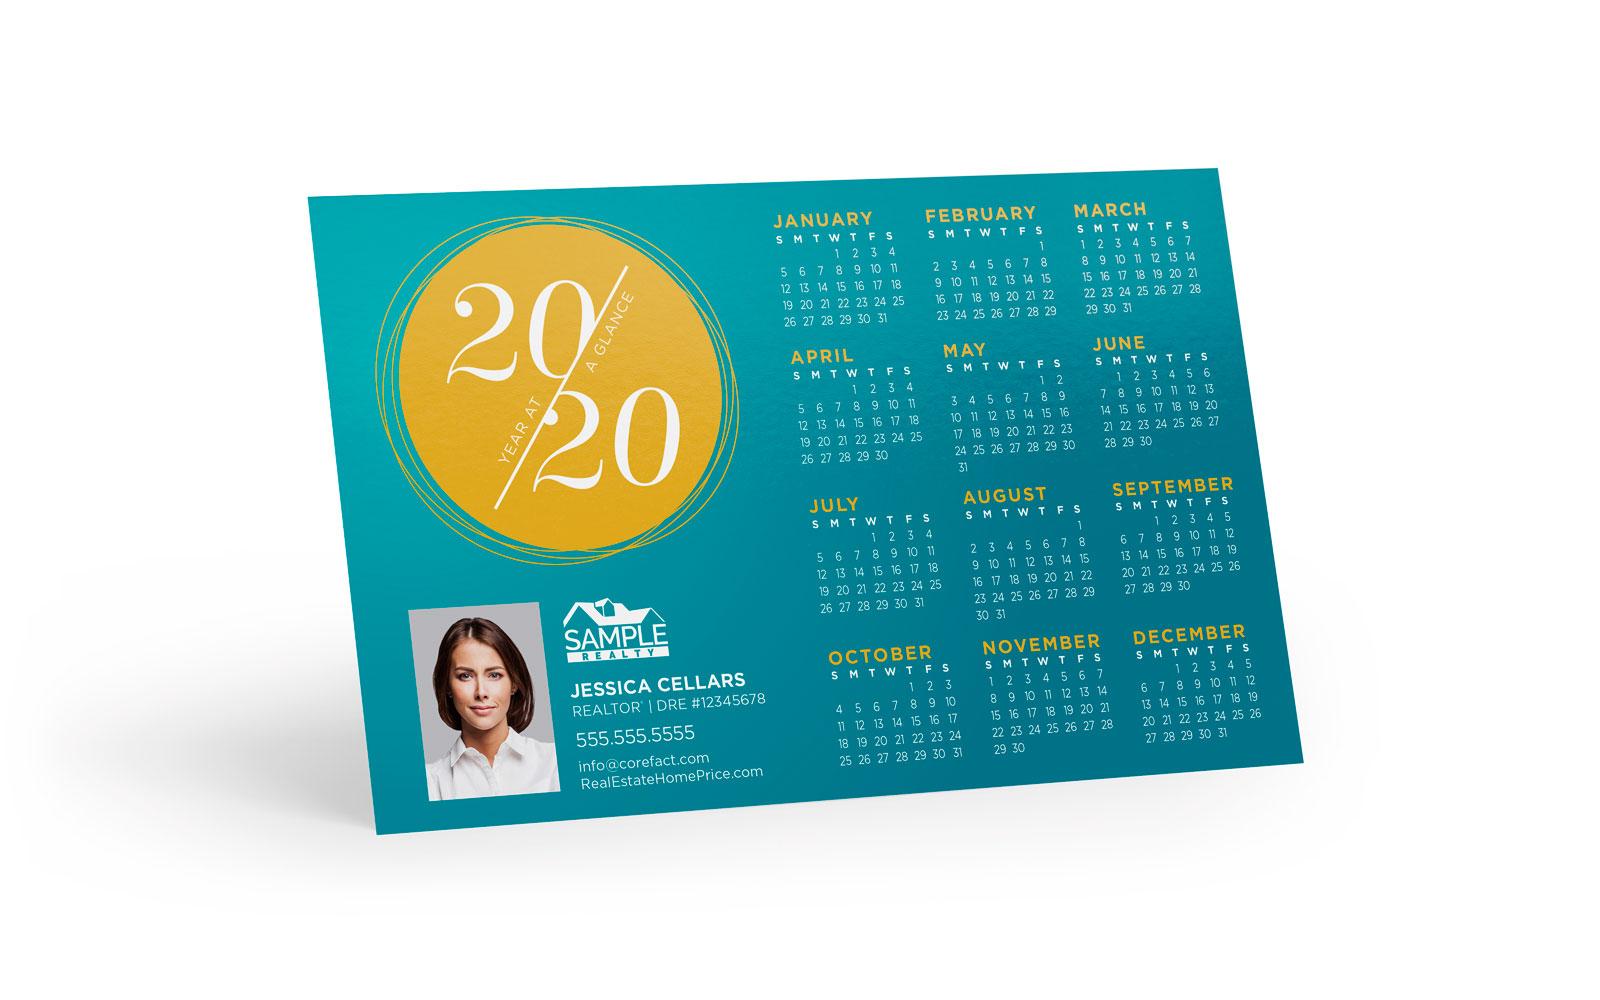 Corefact Calendar 2020 - 10